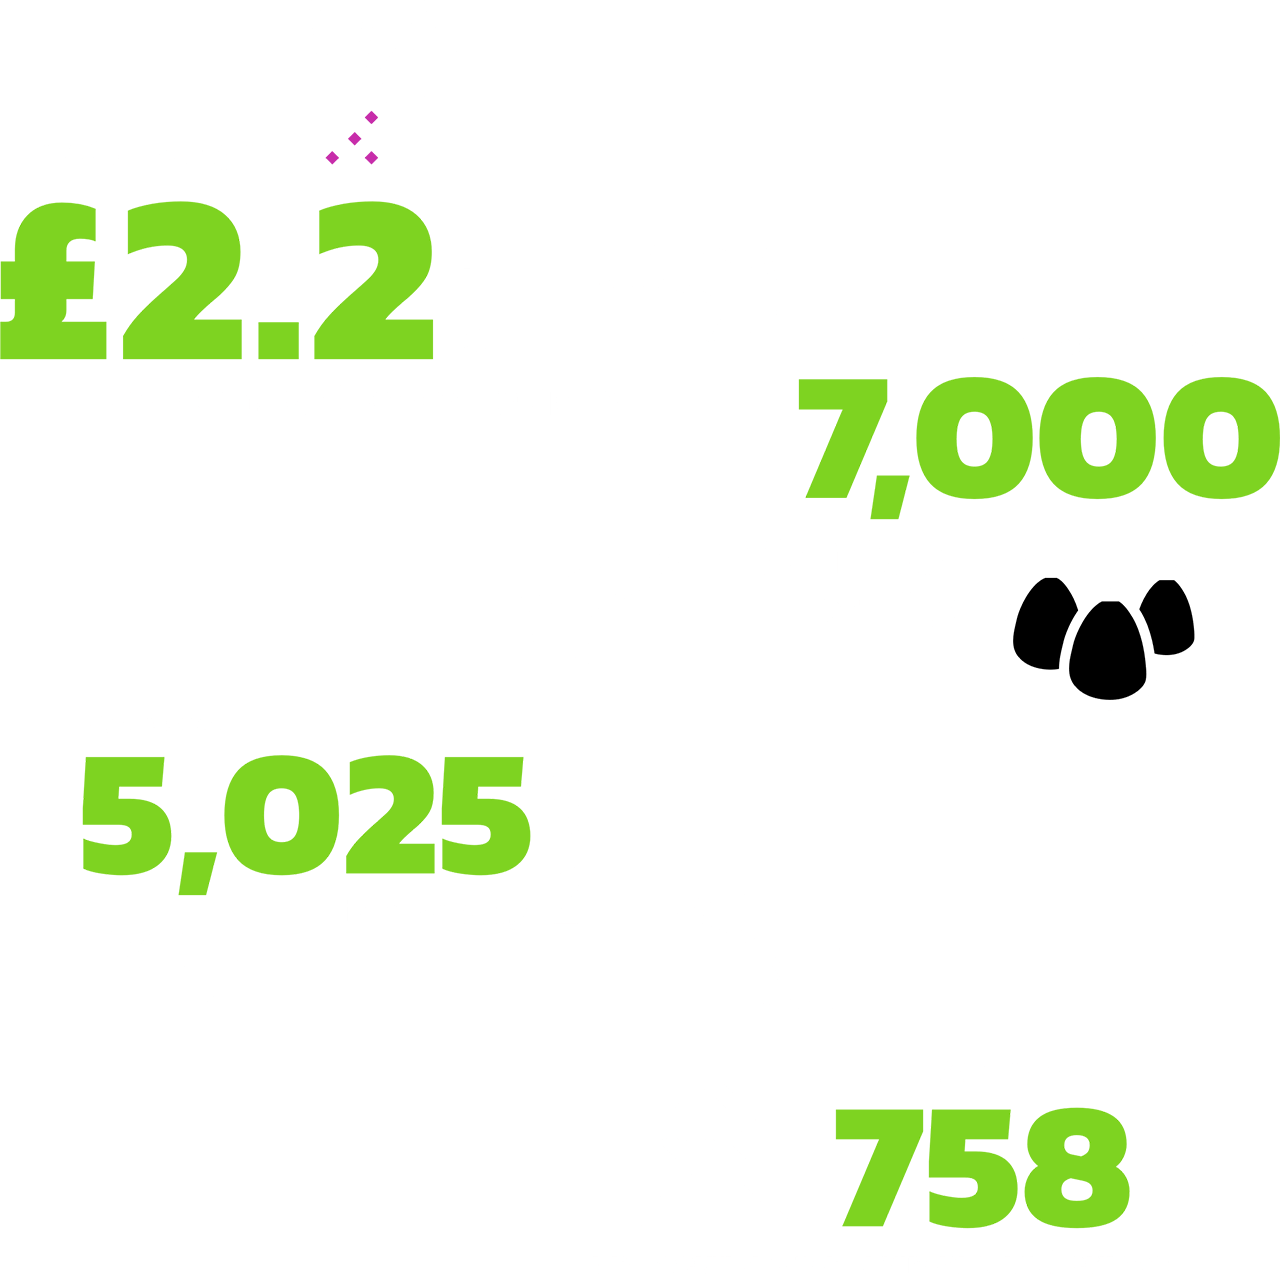 2018 statistics